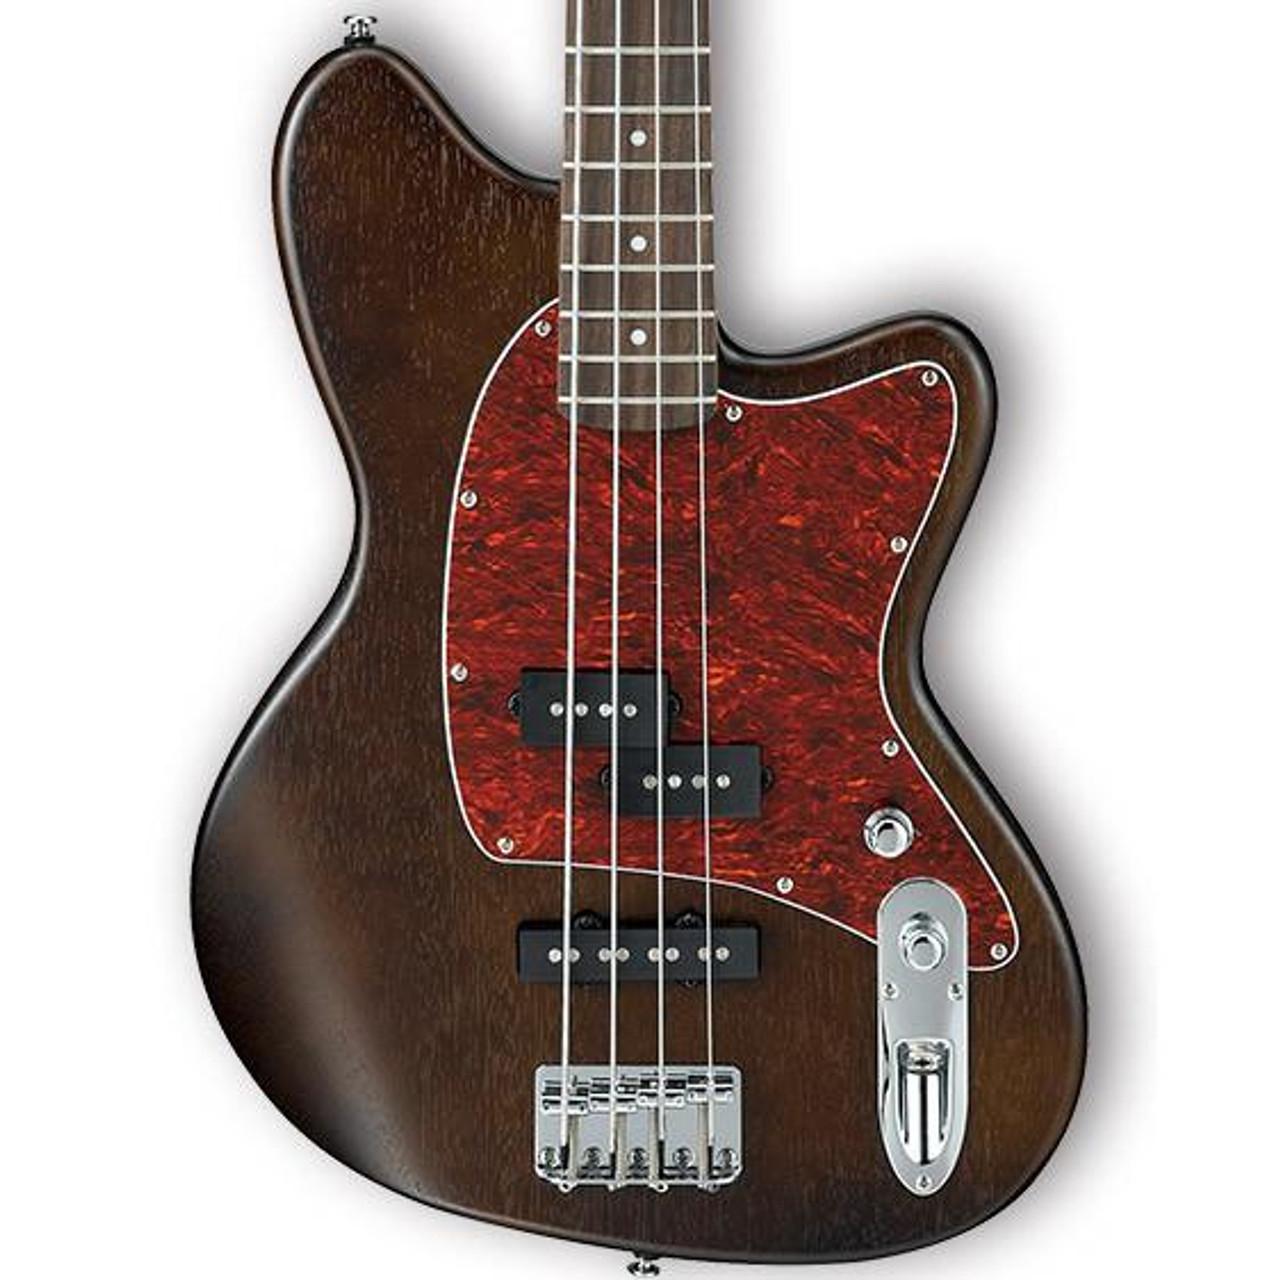 ibanez tmb100 talman bass walnut flat the guitar store. Black Bedroom Furniture Sets. Home Design Ideas